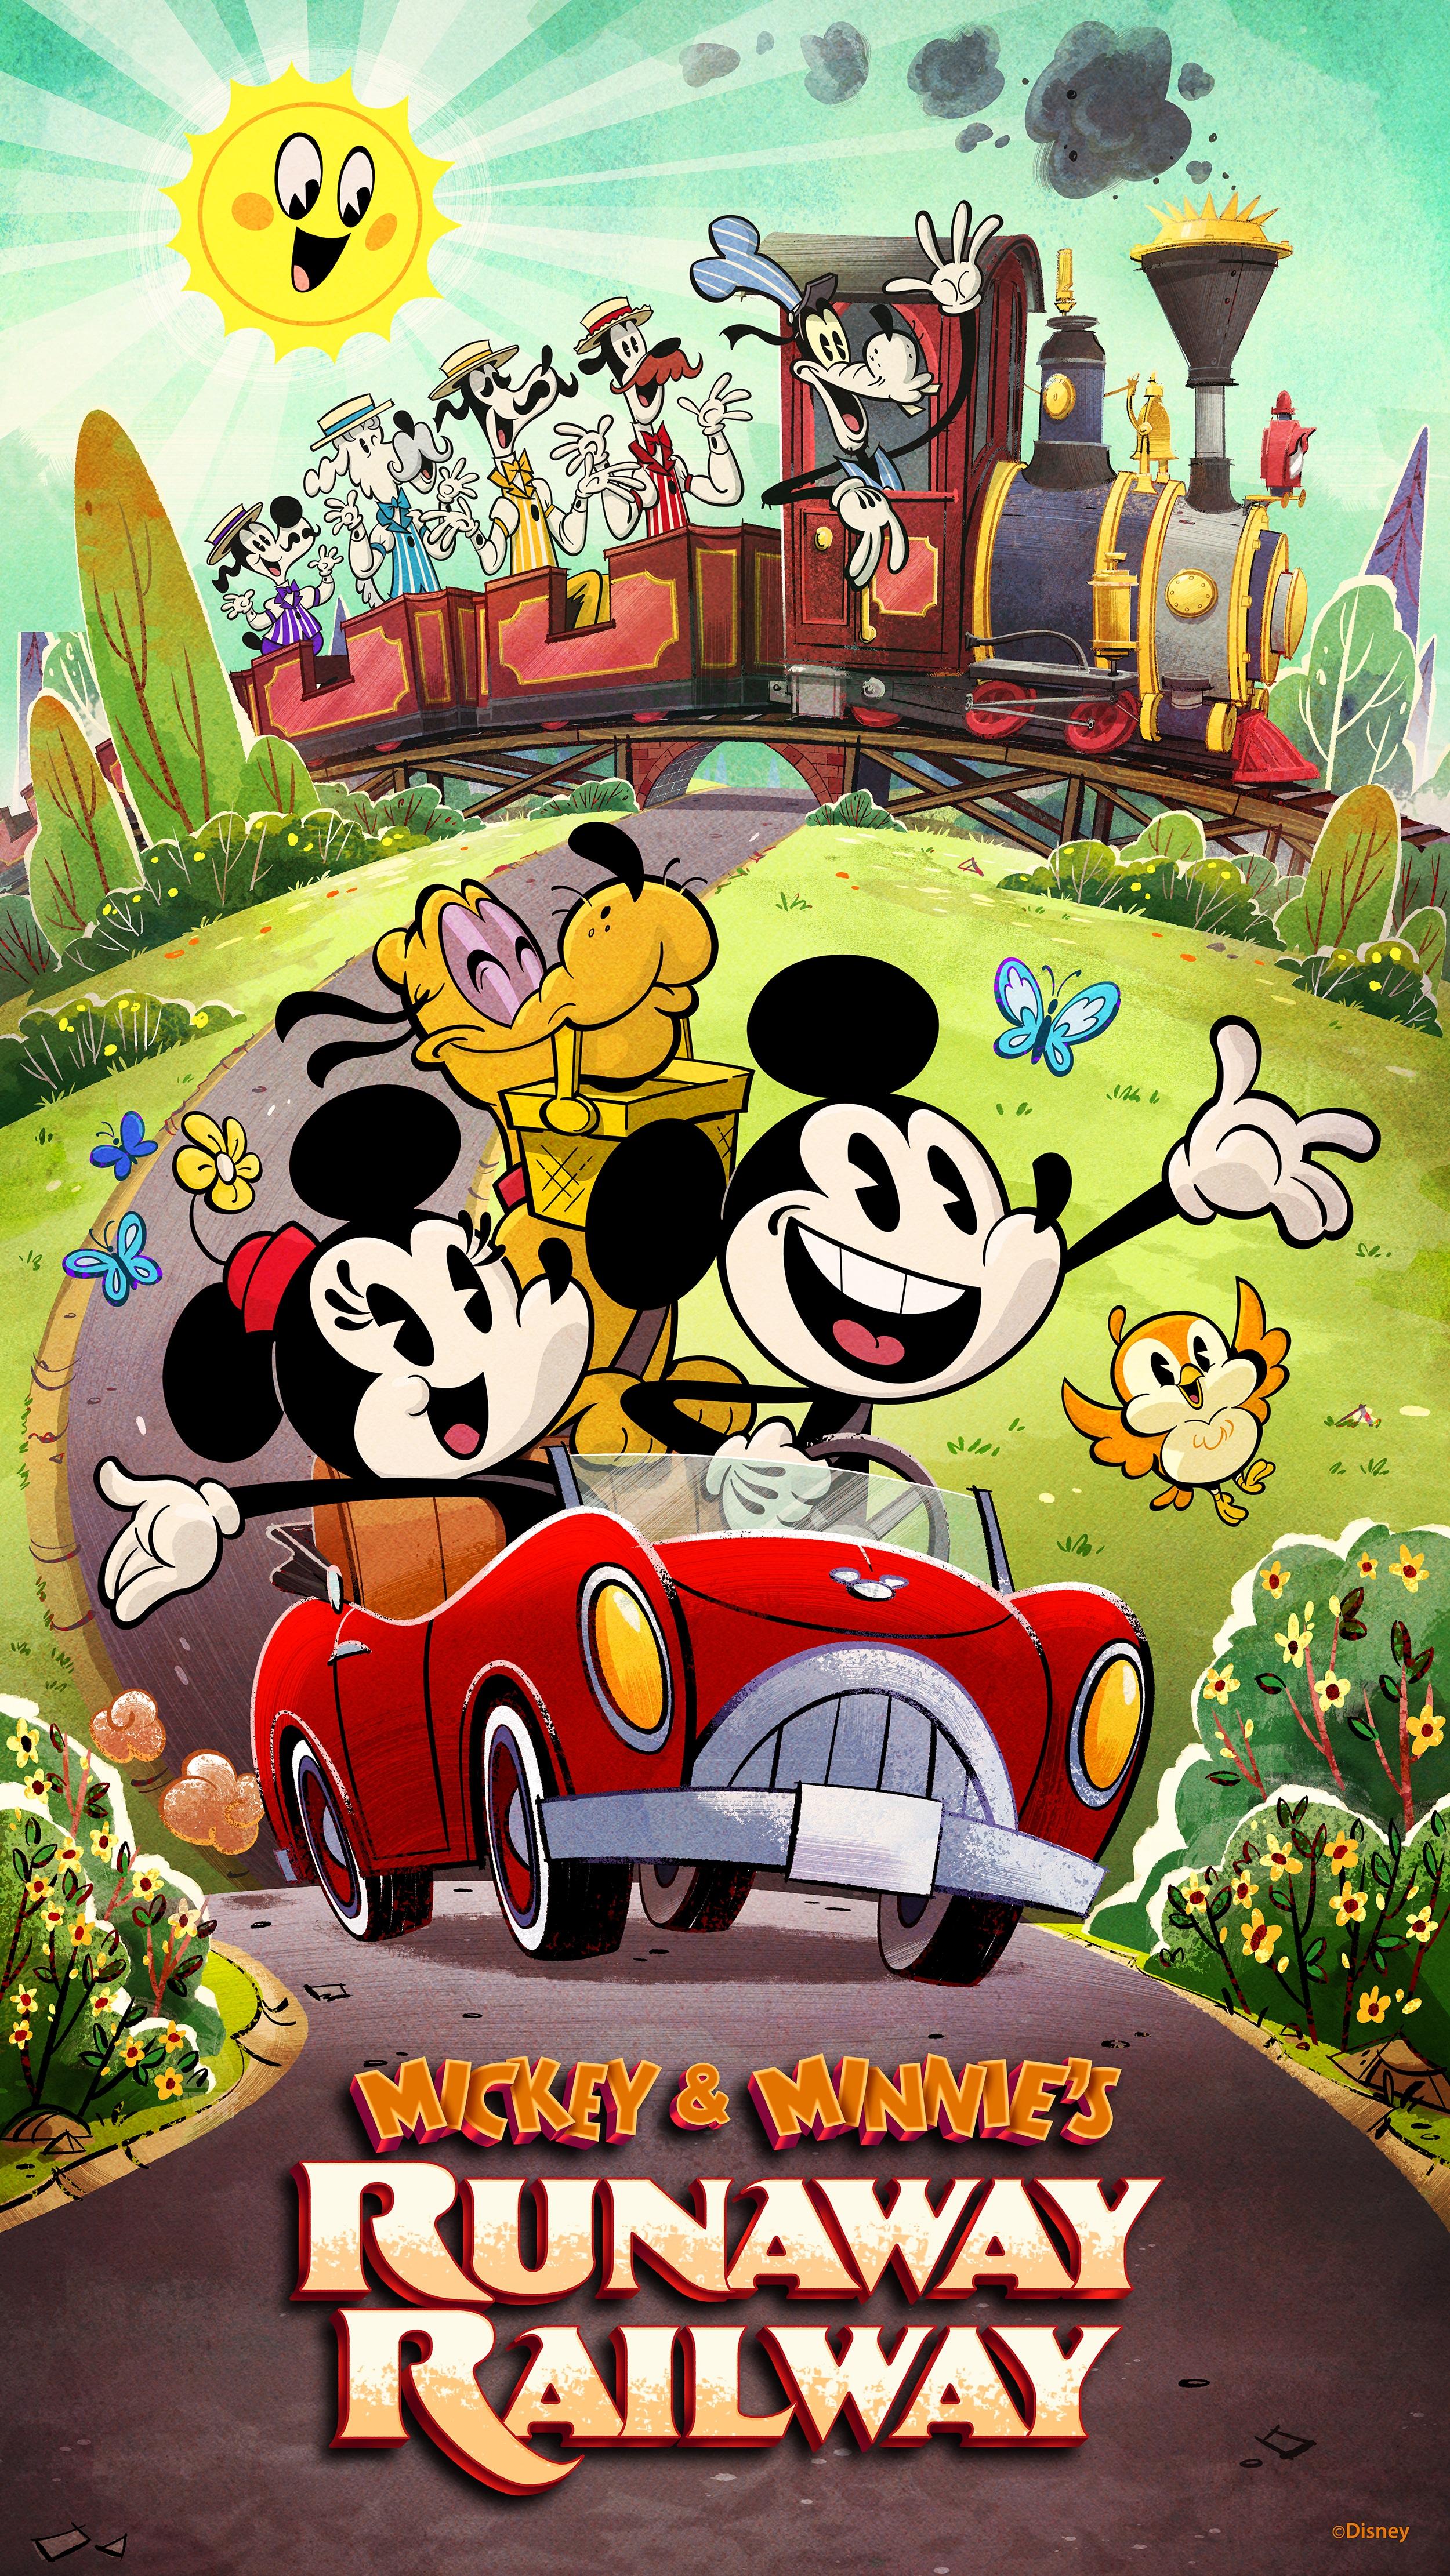 Exclusive Poster Series Celebrates Mickey Minnie S Runaway Railway At Disney S Hollywood Studios Disney Parks Blog